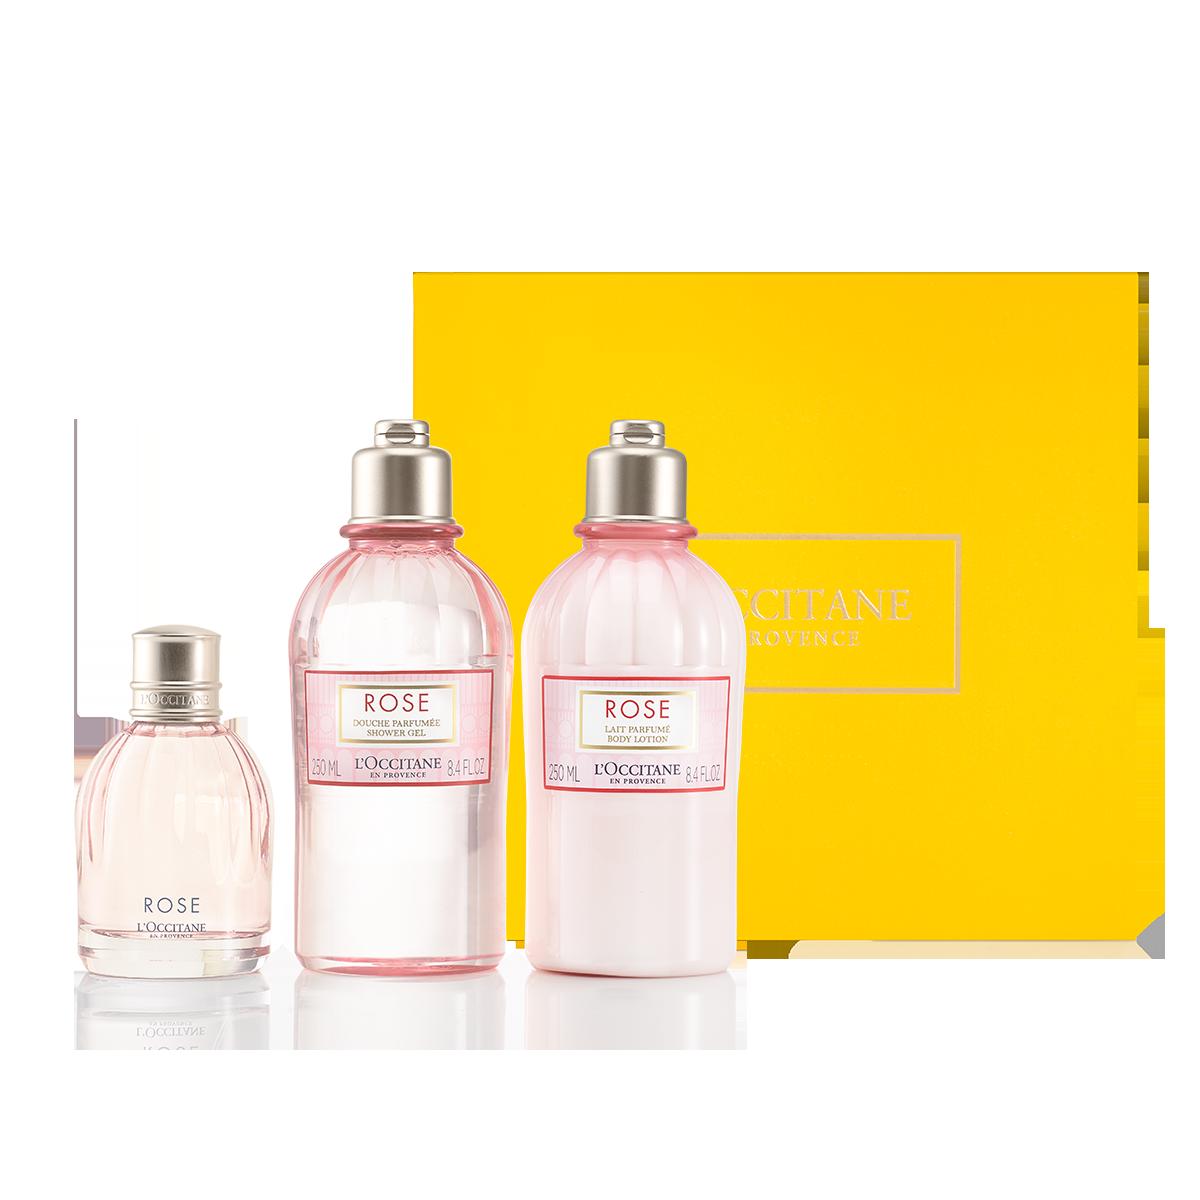 Rose Fragrance Collection - L'Occitane